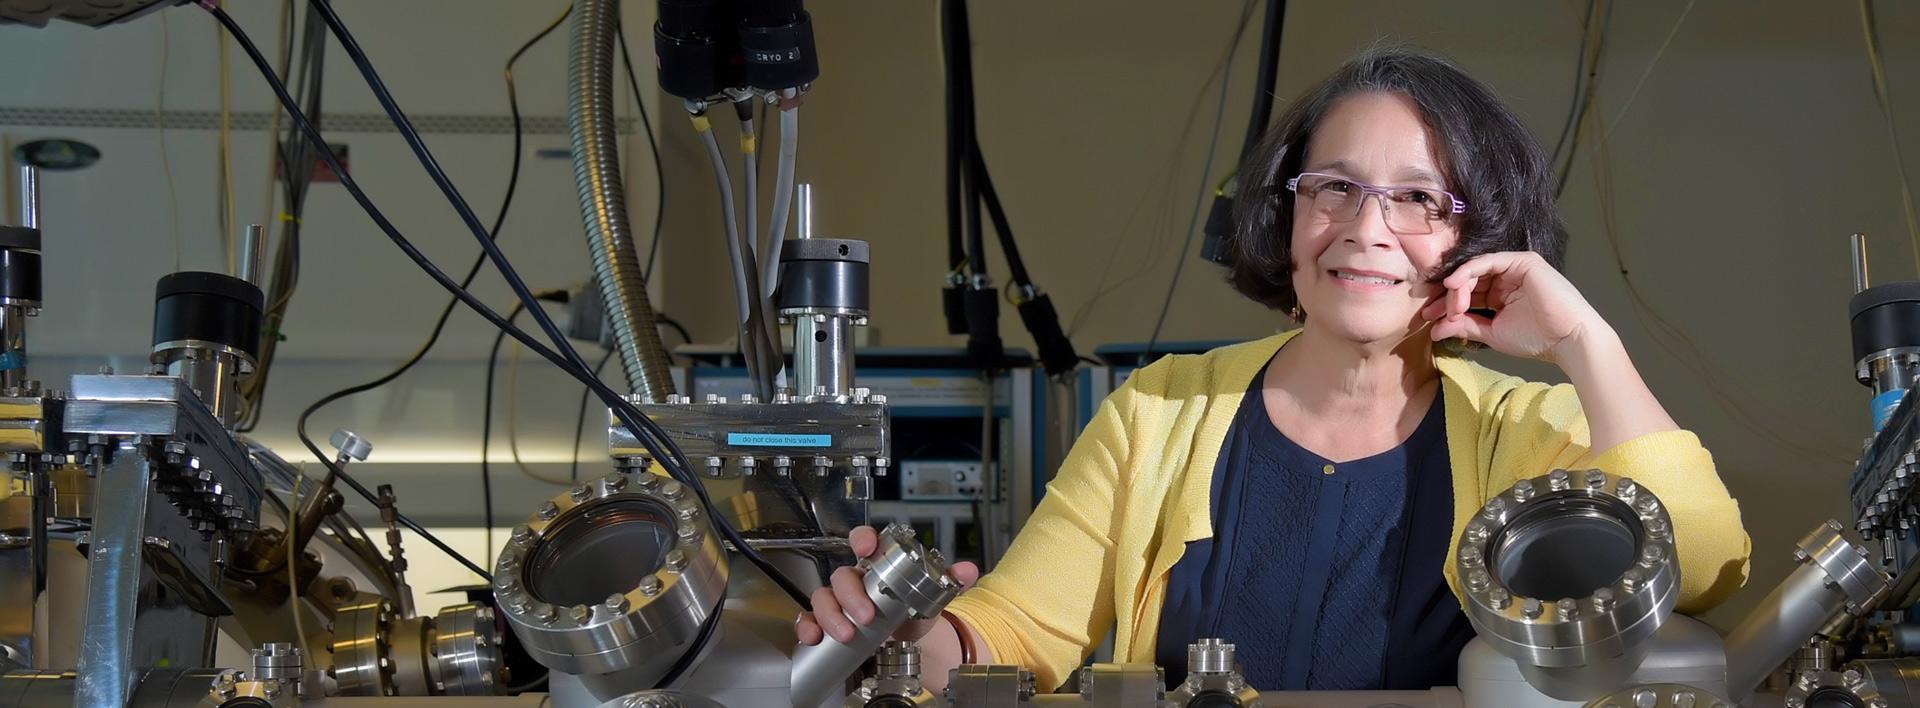 Chemistry Prof. Wins $5M NSF Grant